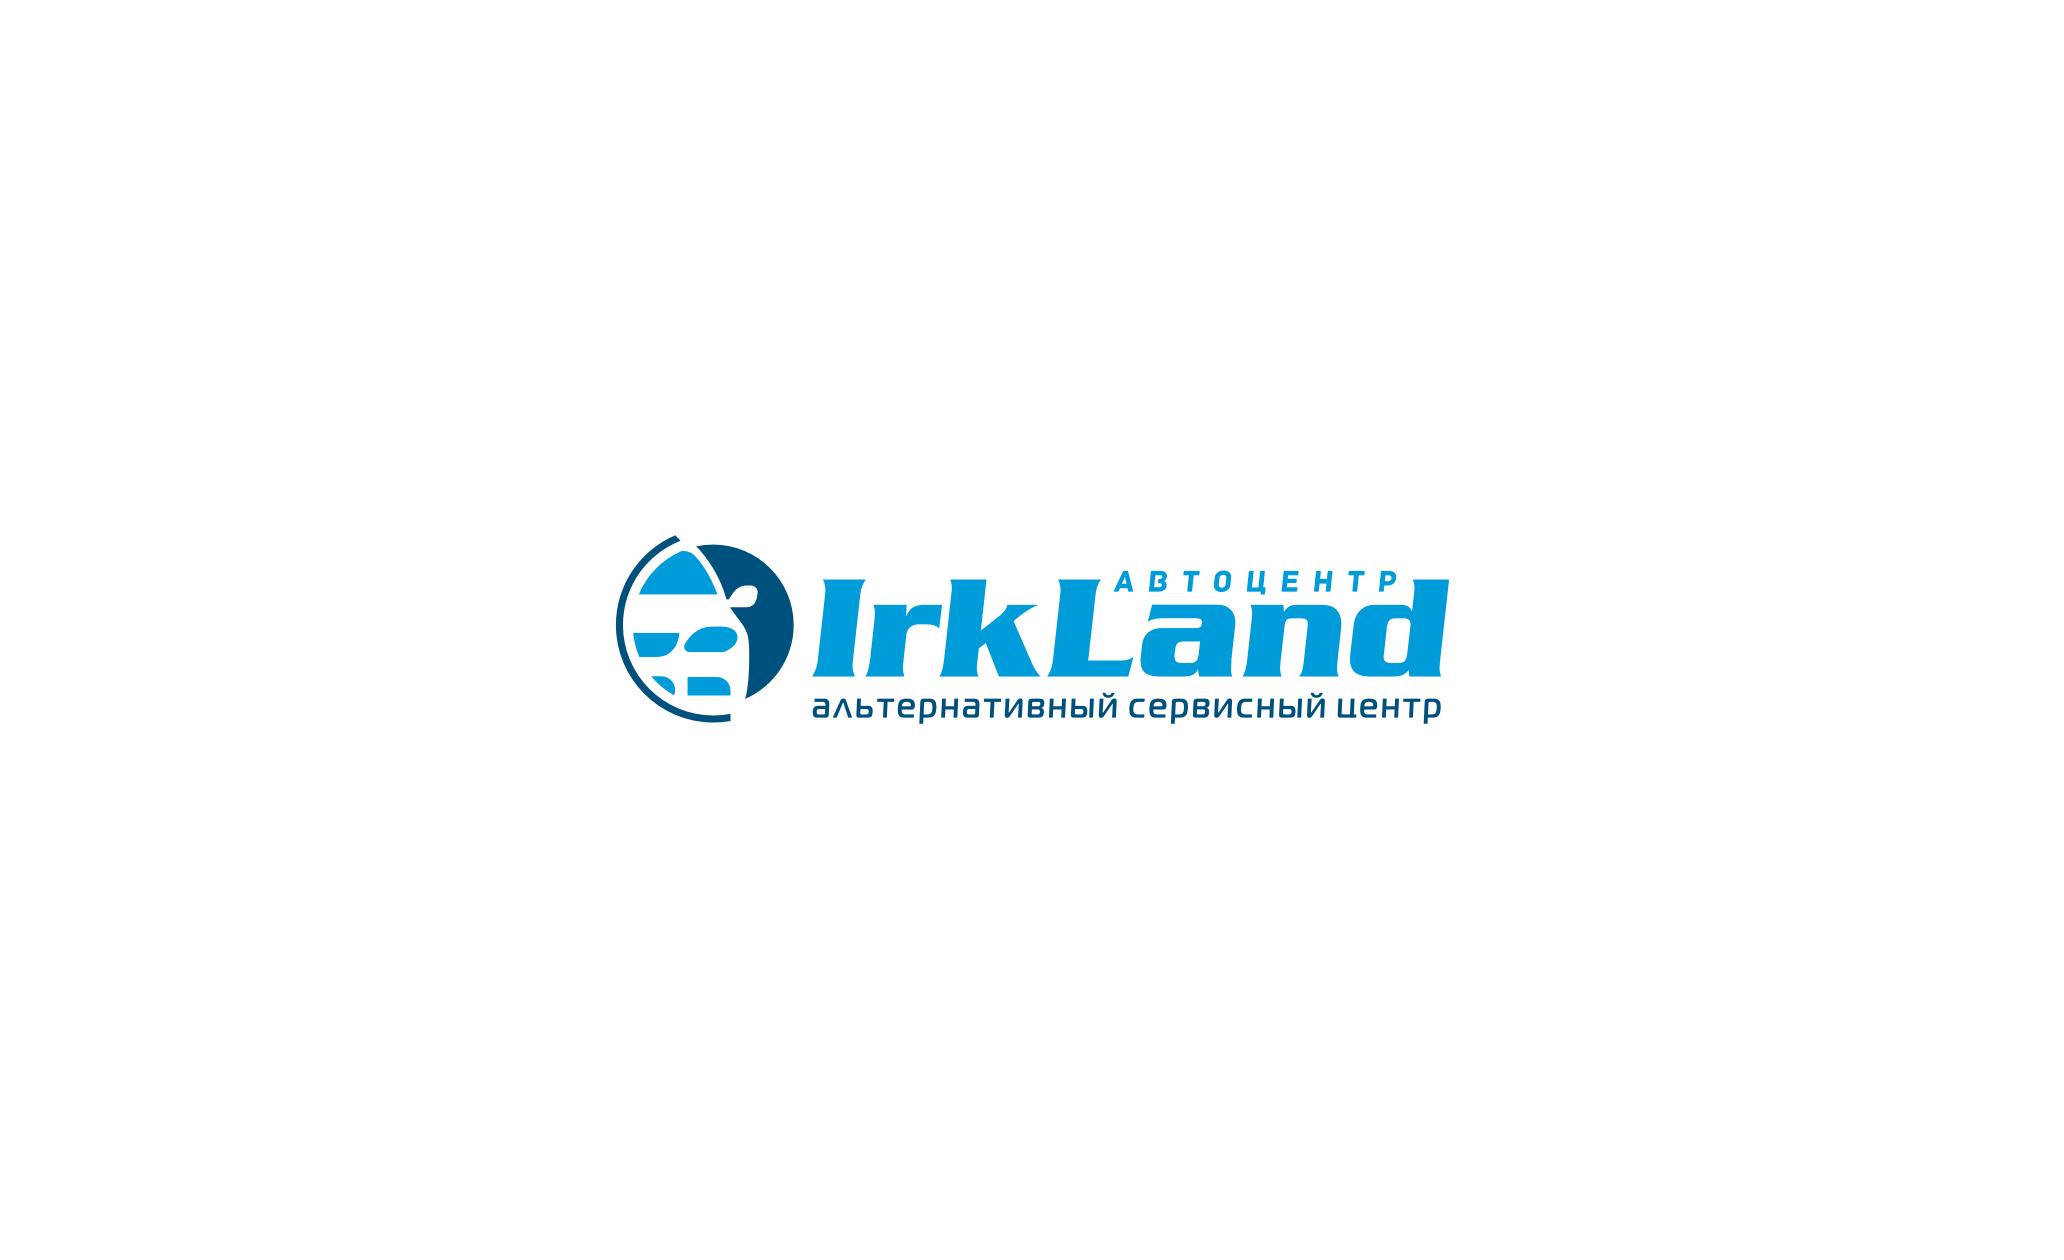 IrkLand